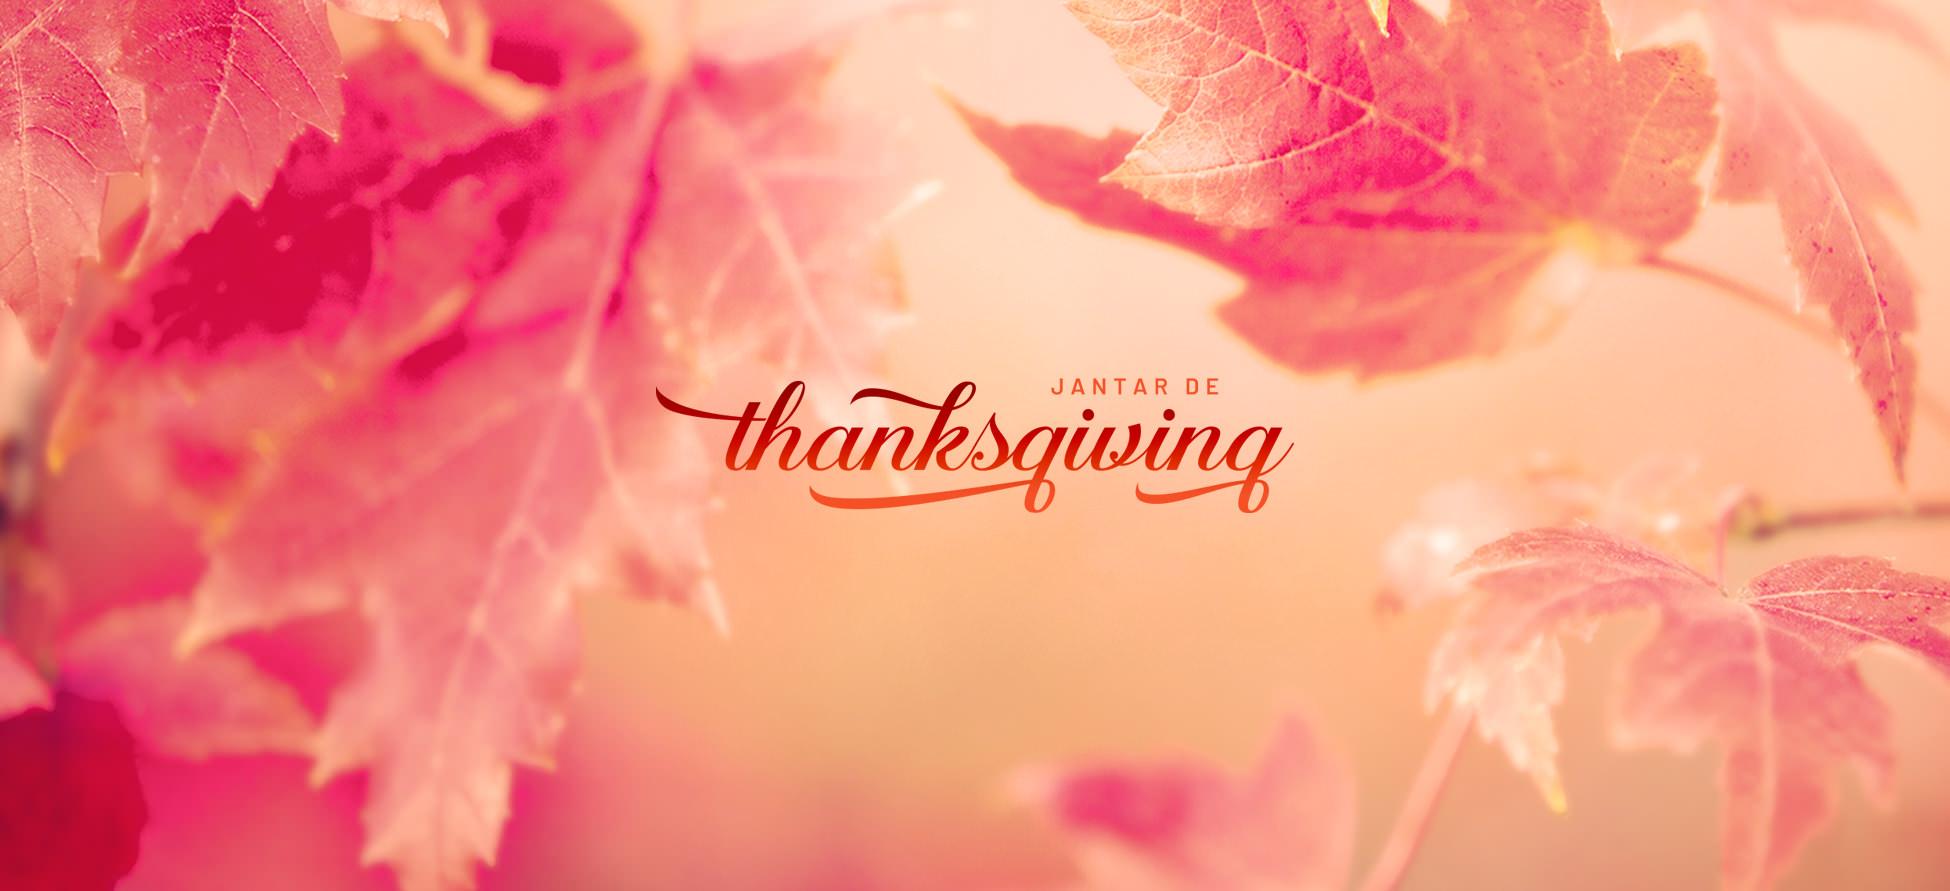 Jantar_Thanksgiving_Website_1950x891px_2019